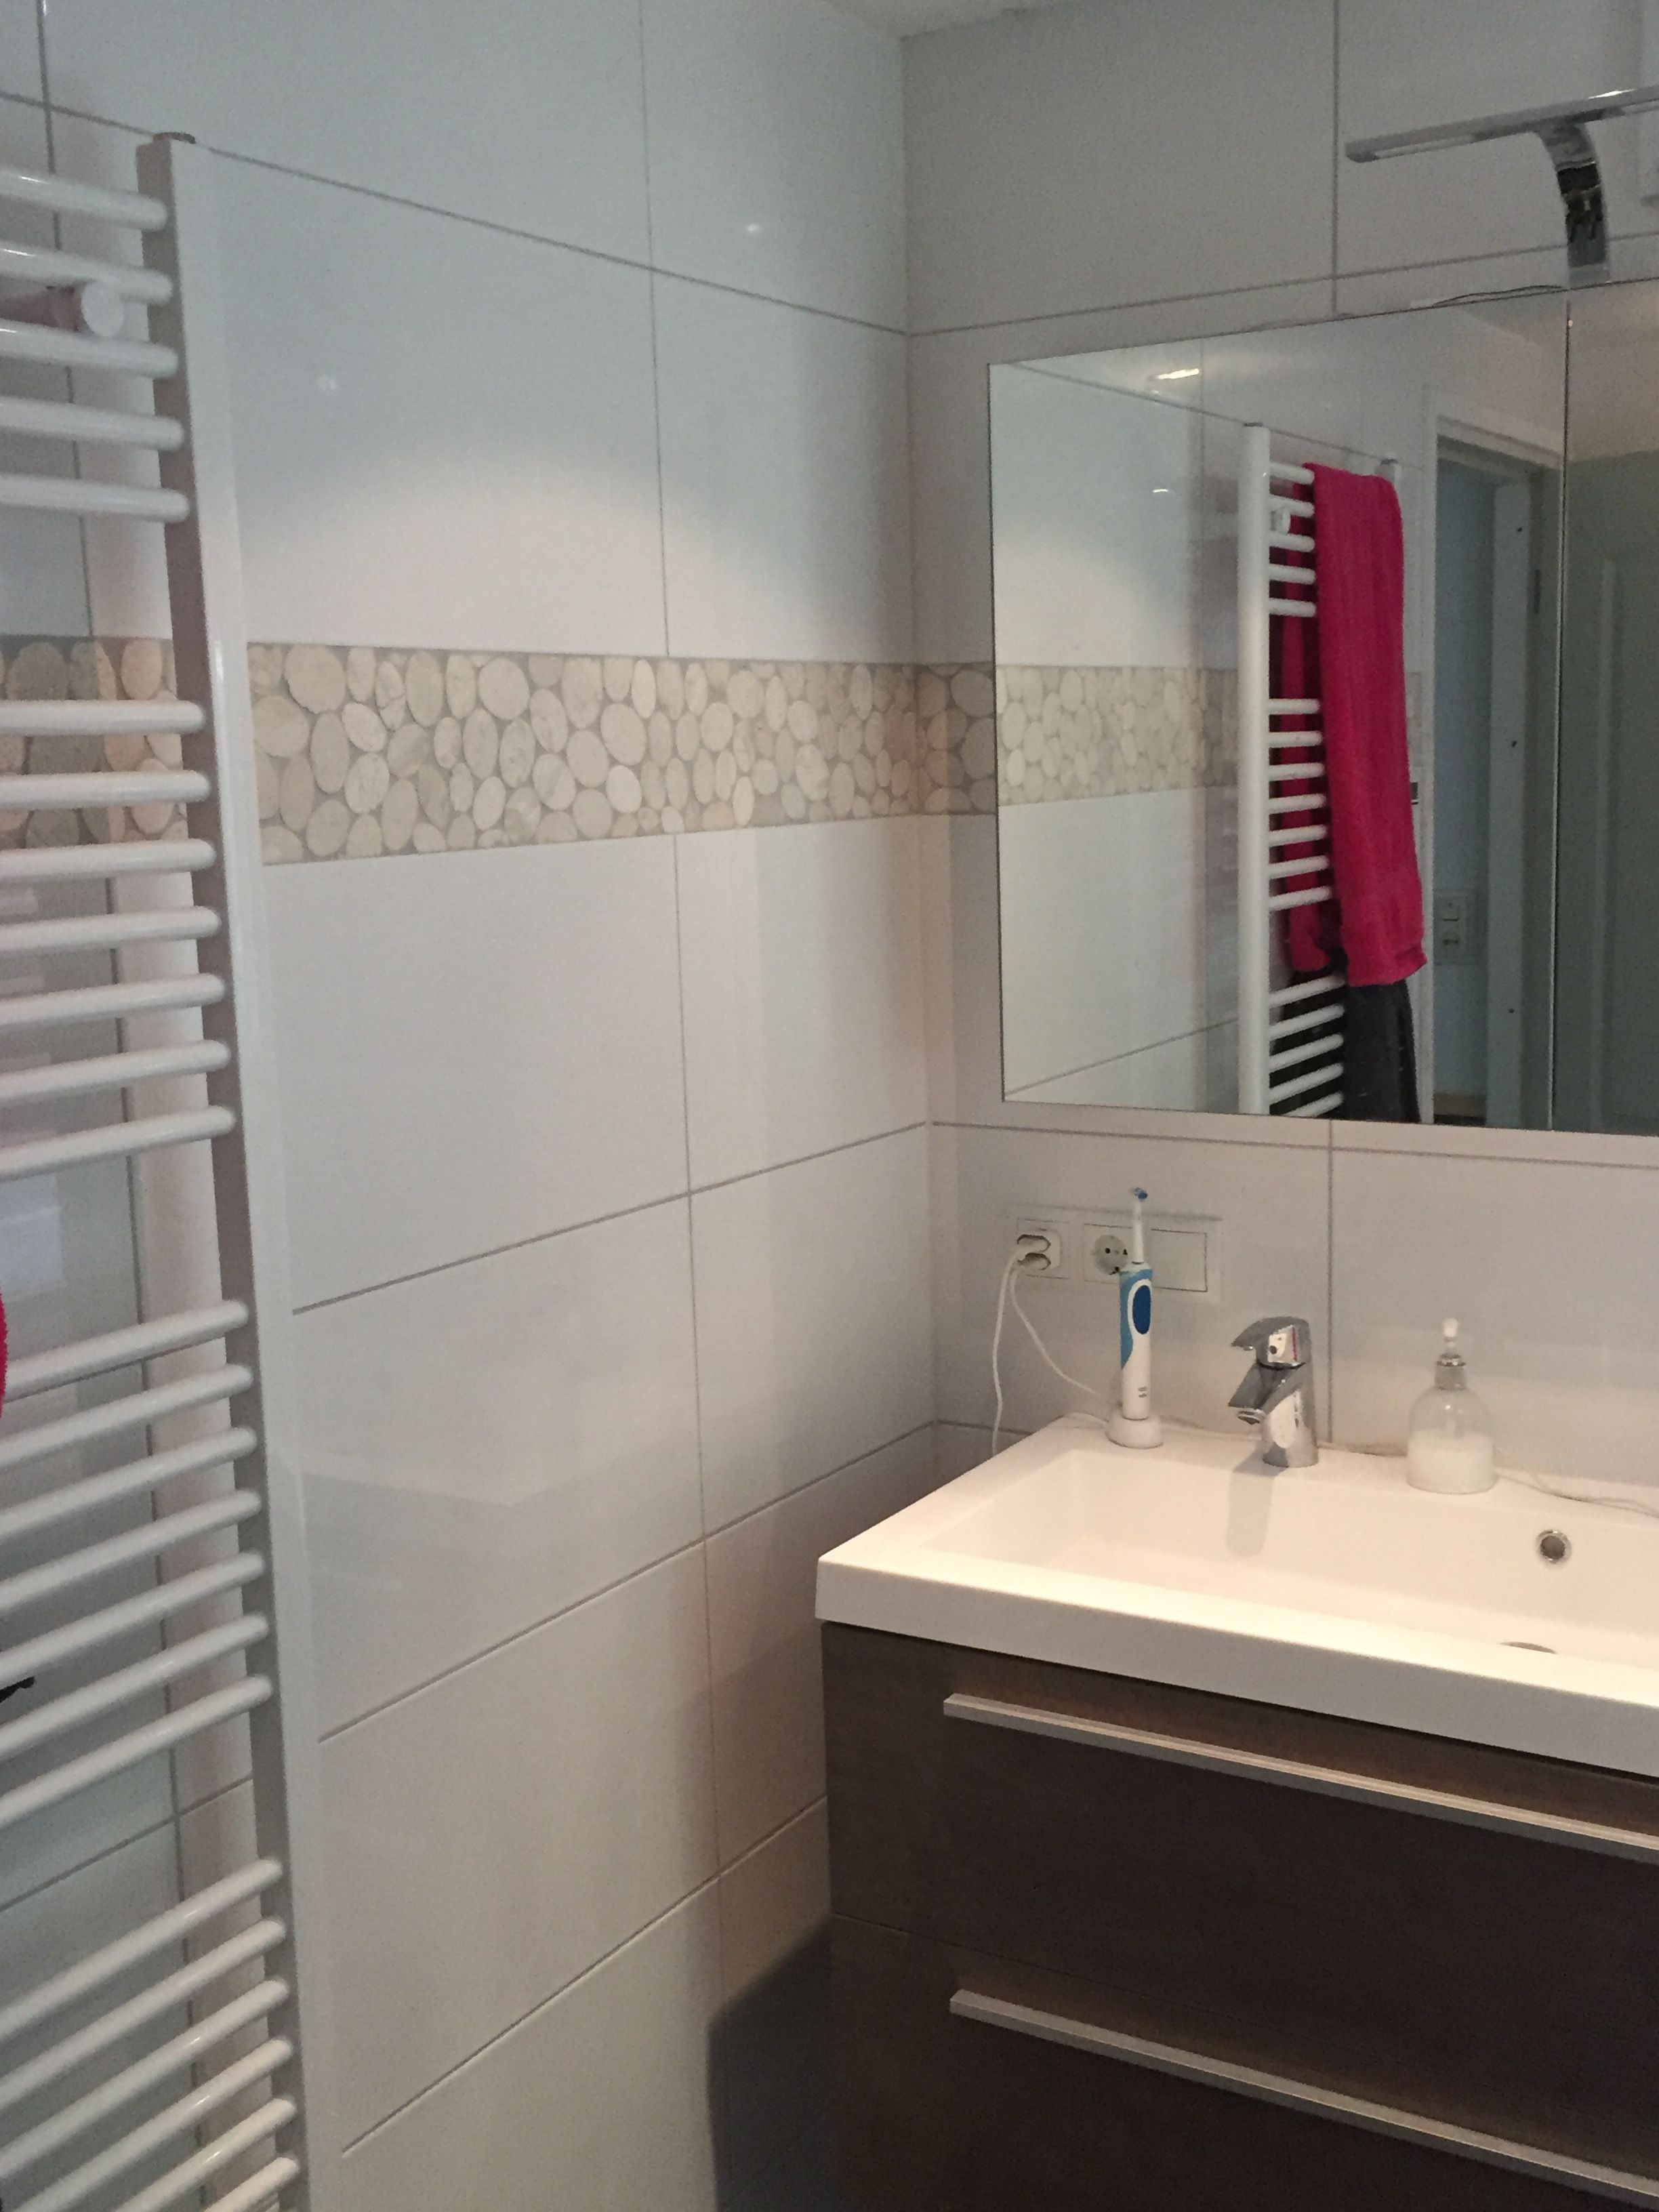 Badkamer met kiezelrand   Tegelhuys ☼ Badkamer tegels / tiles ...